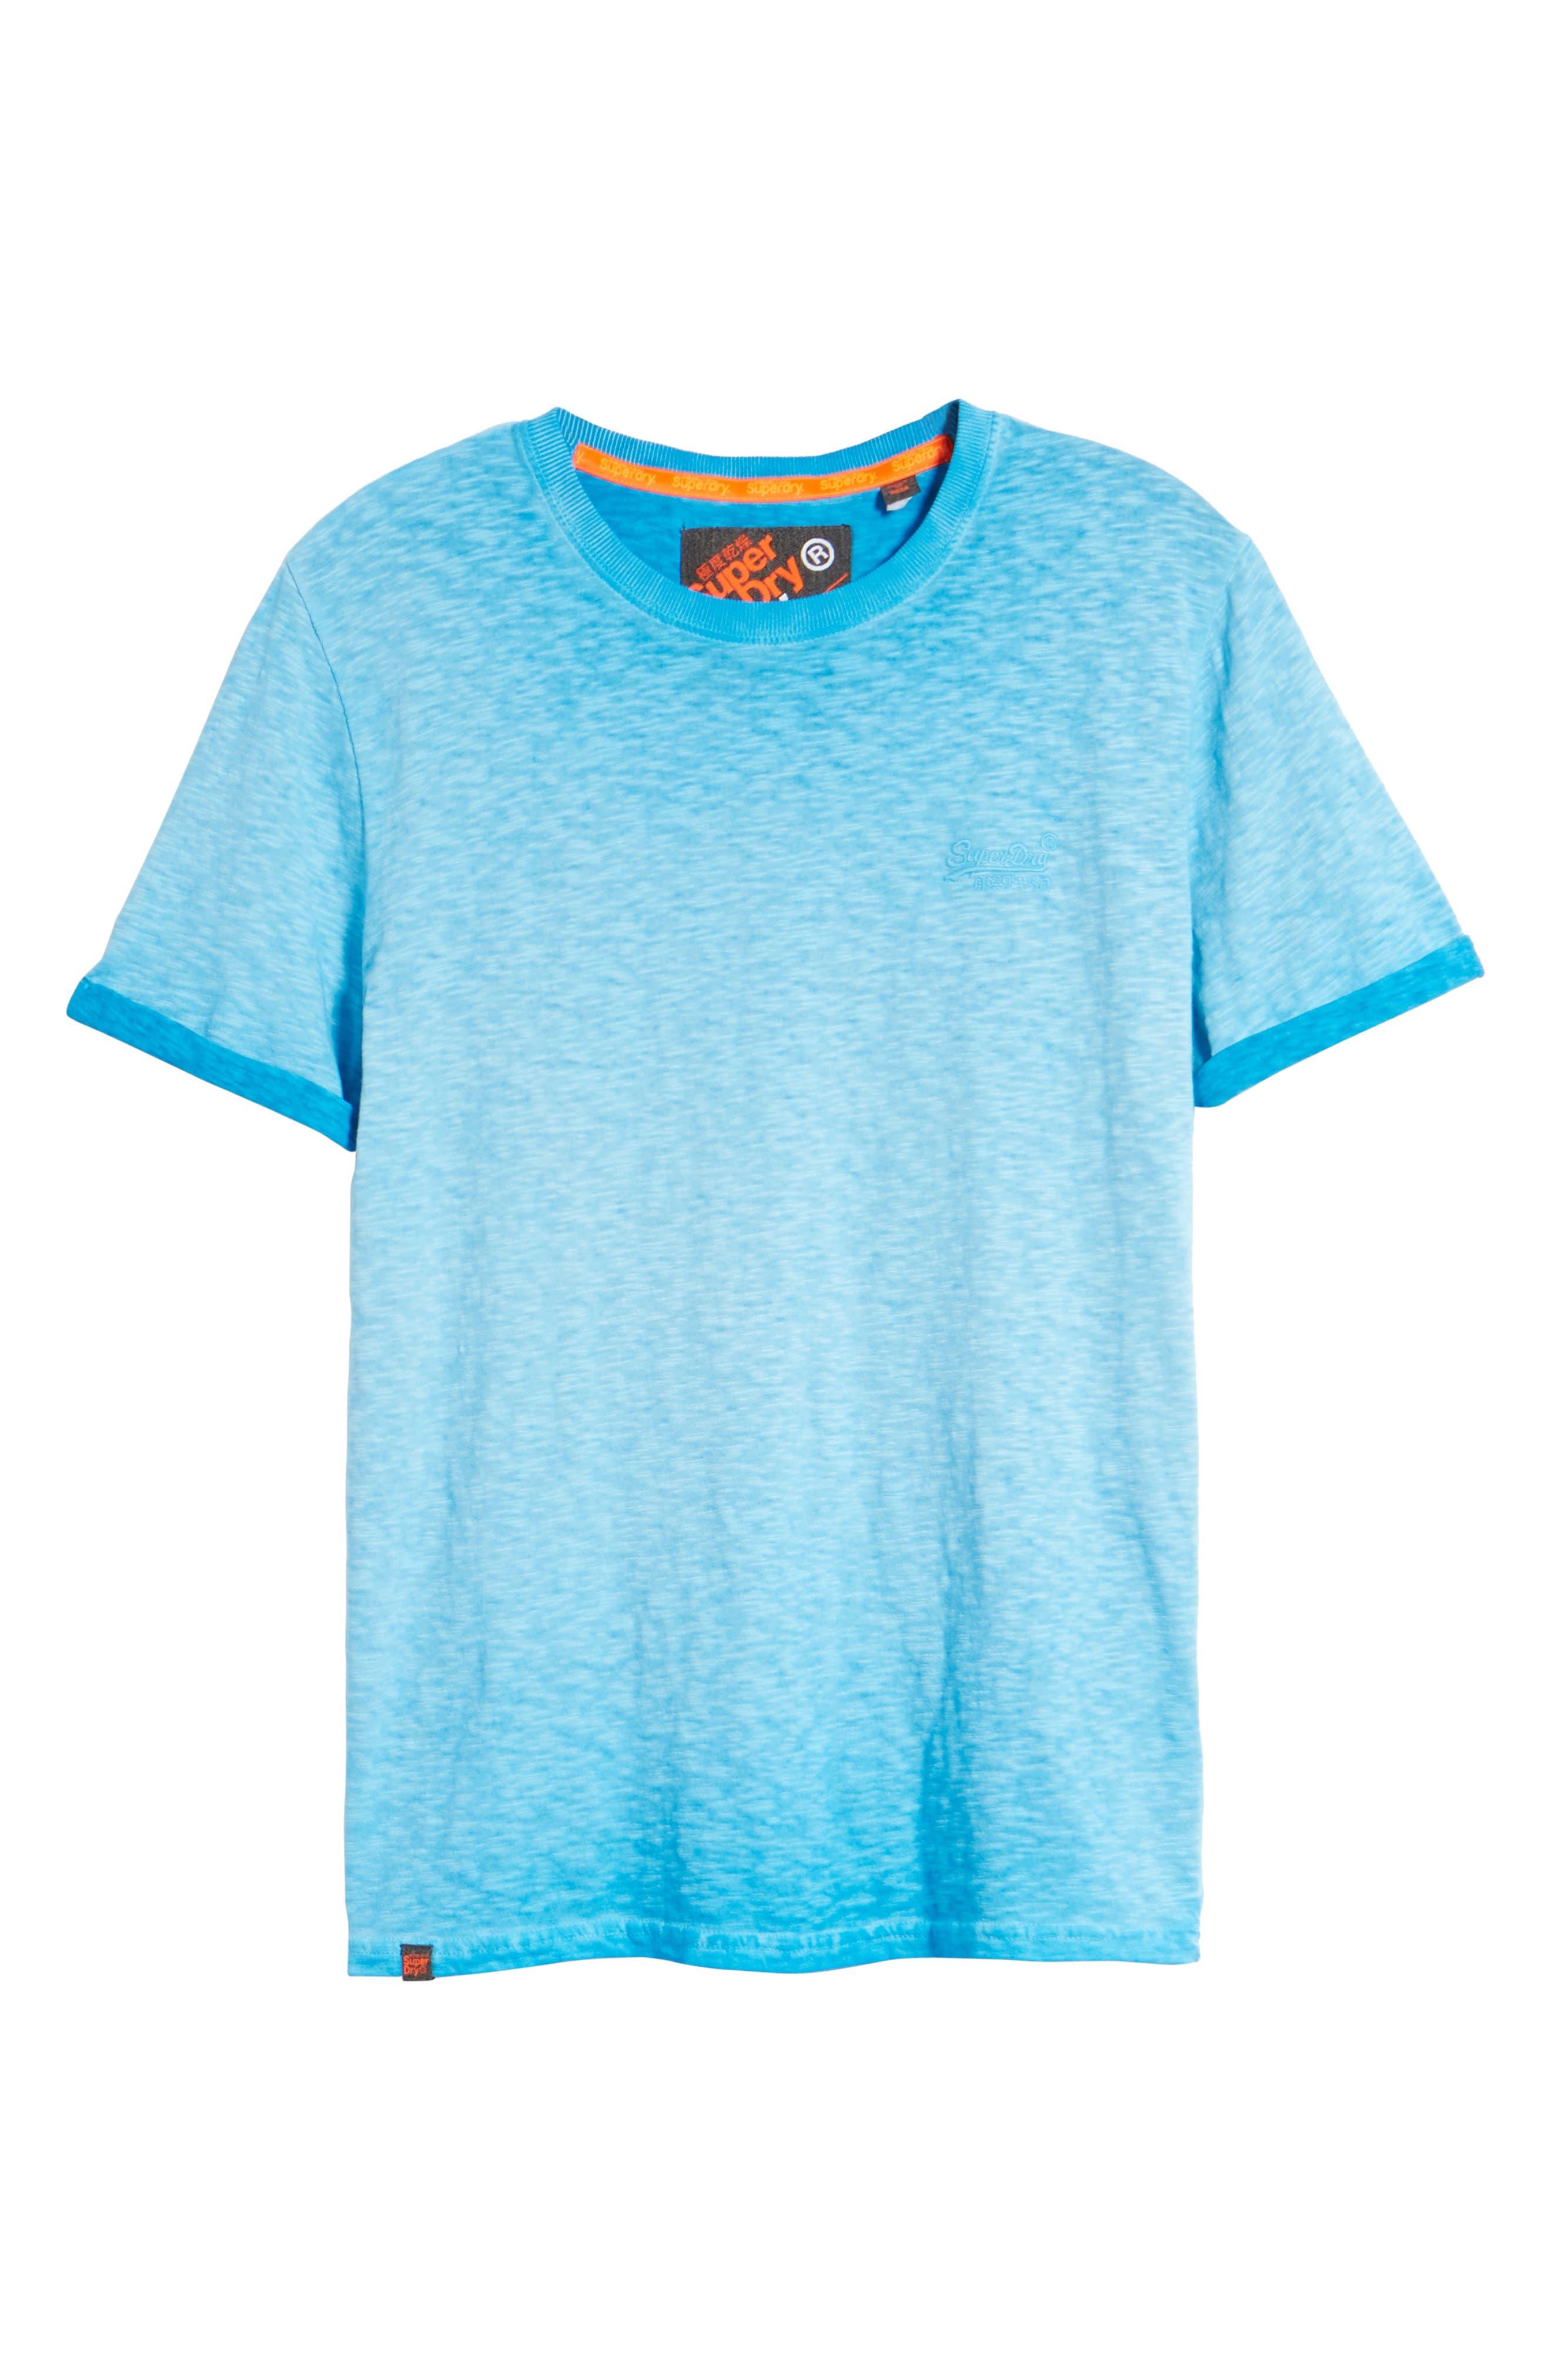 Orange Label Low Roller T-Shirt,                             Alternate thumbnail 29, color,